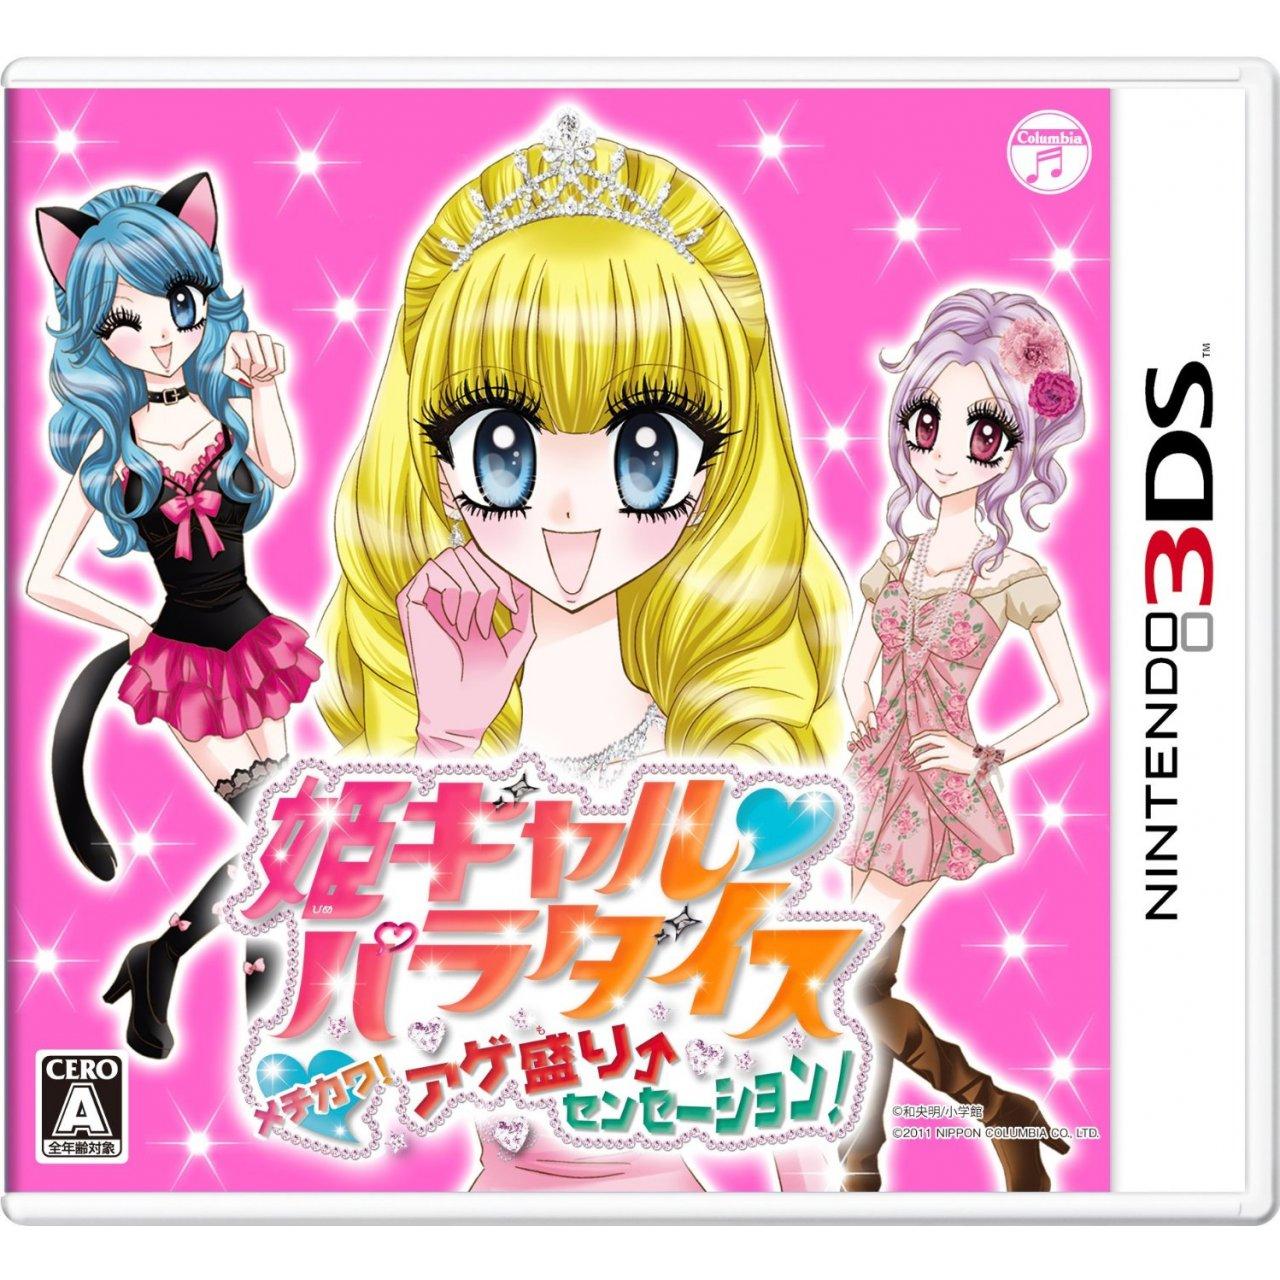 [3DS][姫ギャルパラダイス メチカワ!アゲ盛り↑センセーション!] ROM (JPN) 3DS Download